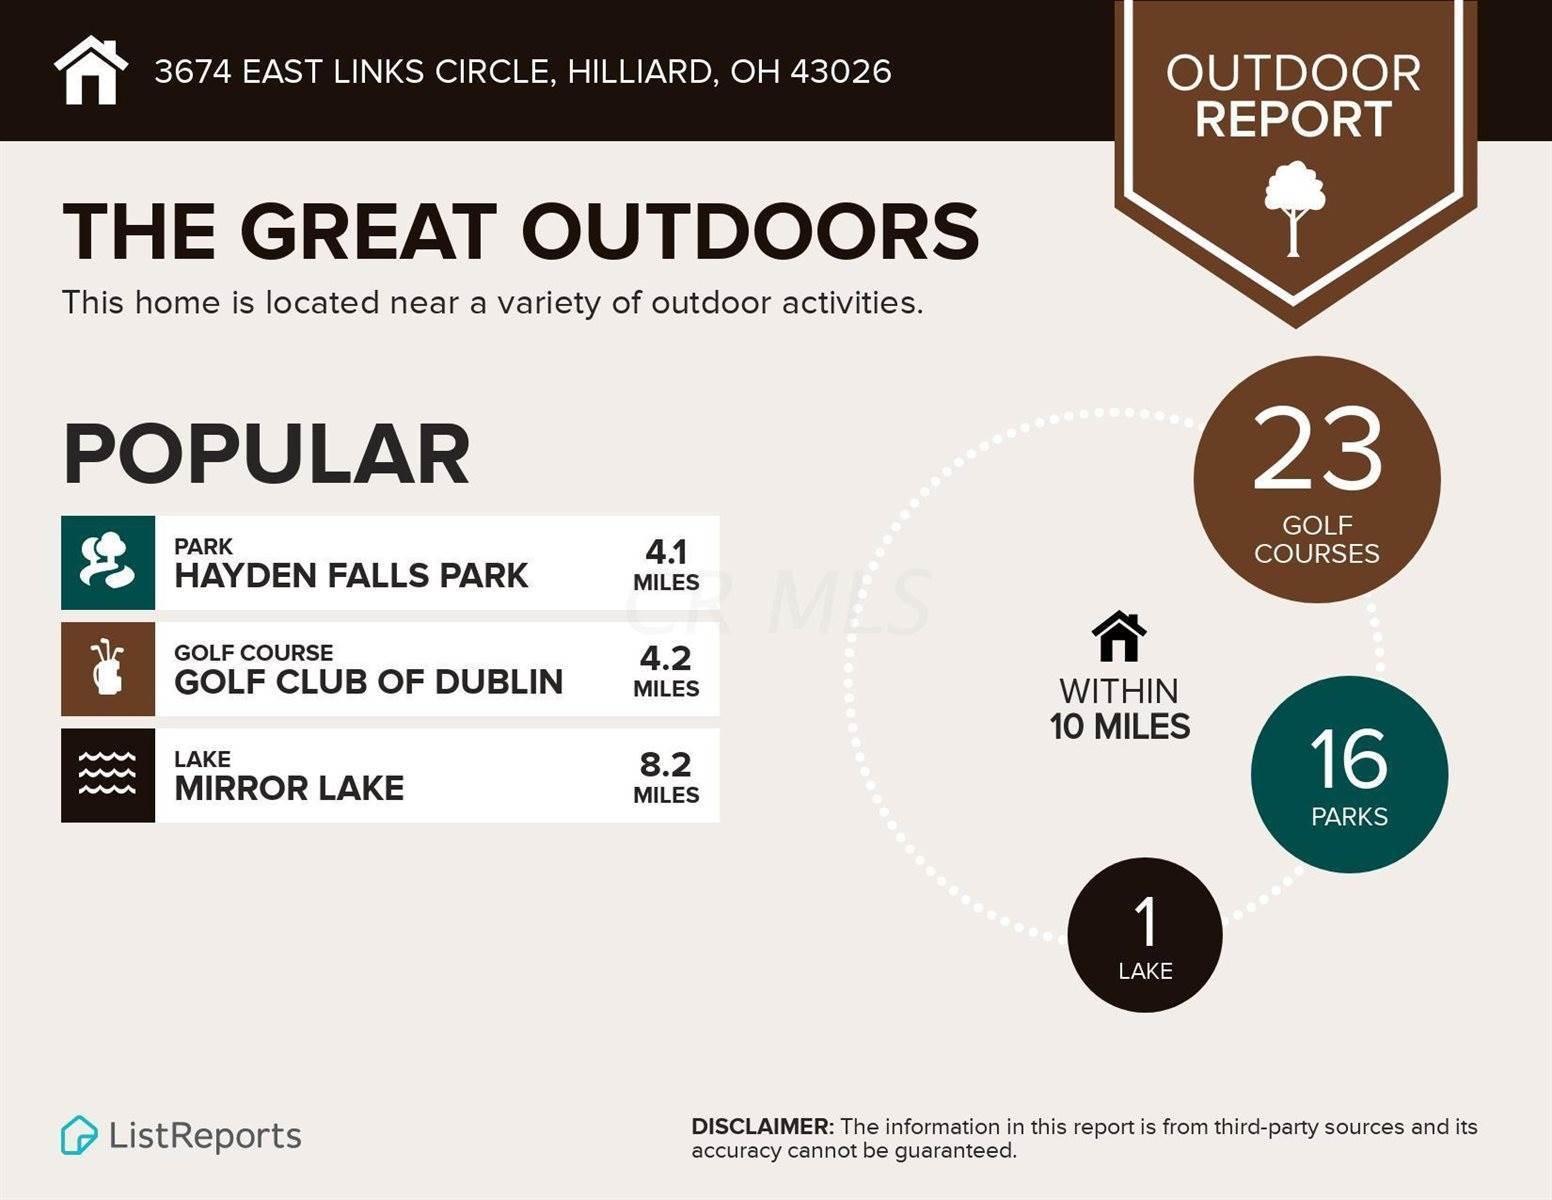 3674 East Links Circle, #13-367, Hilliard, OH 43026